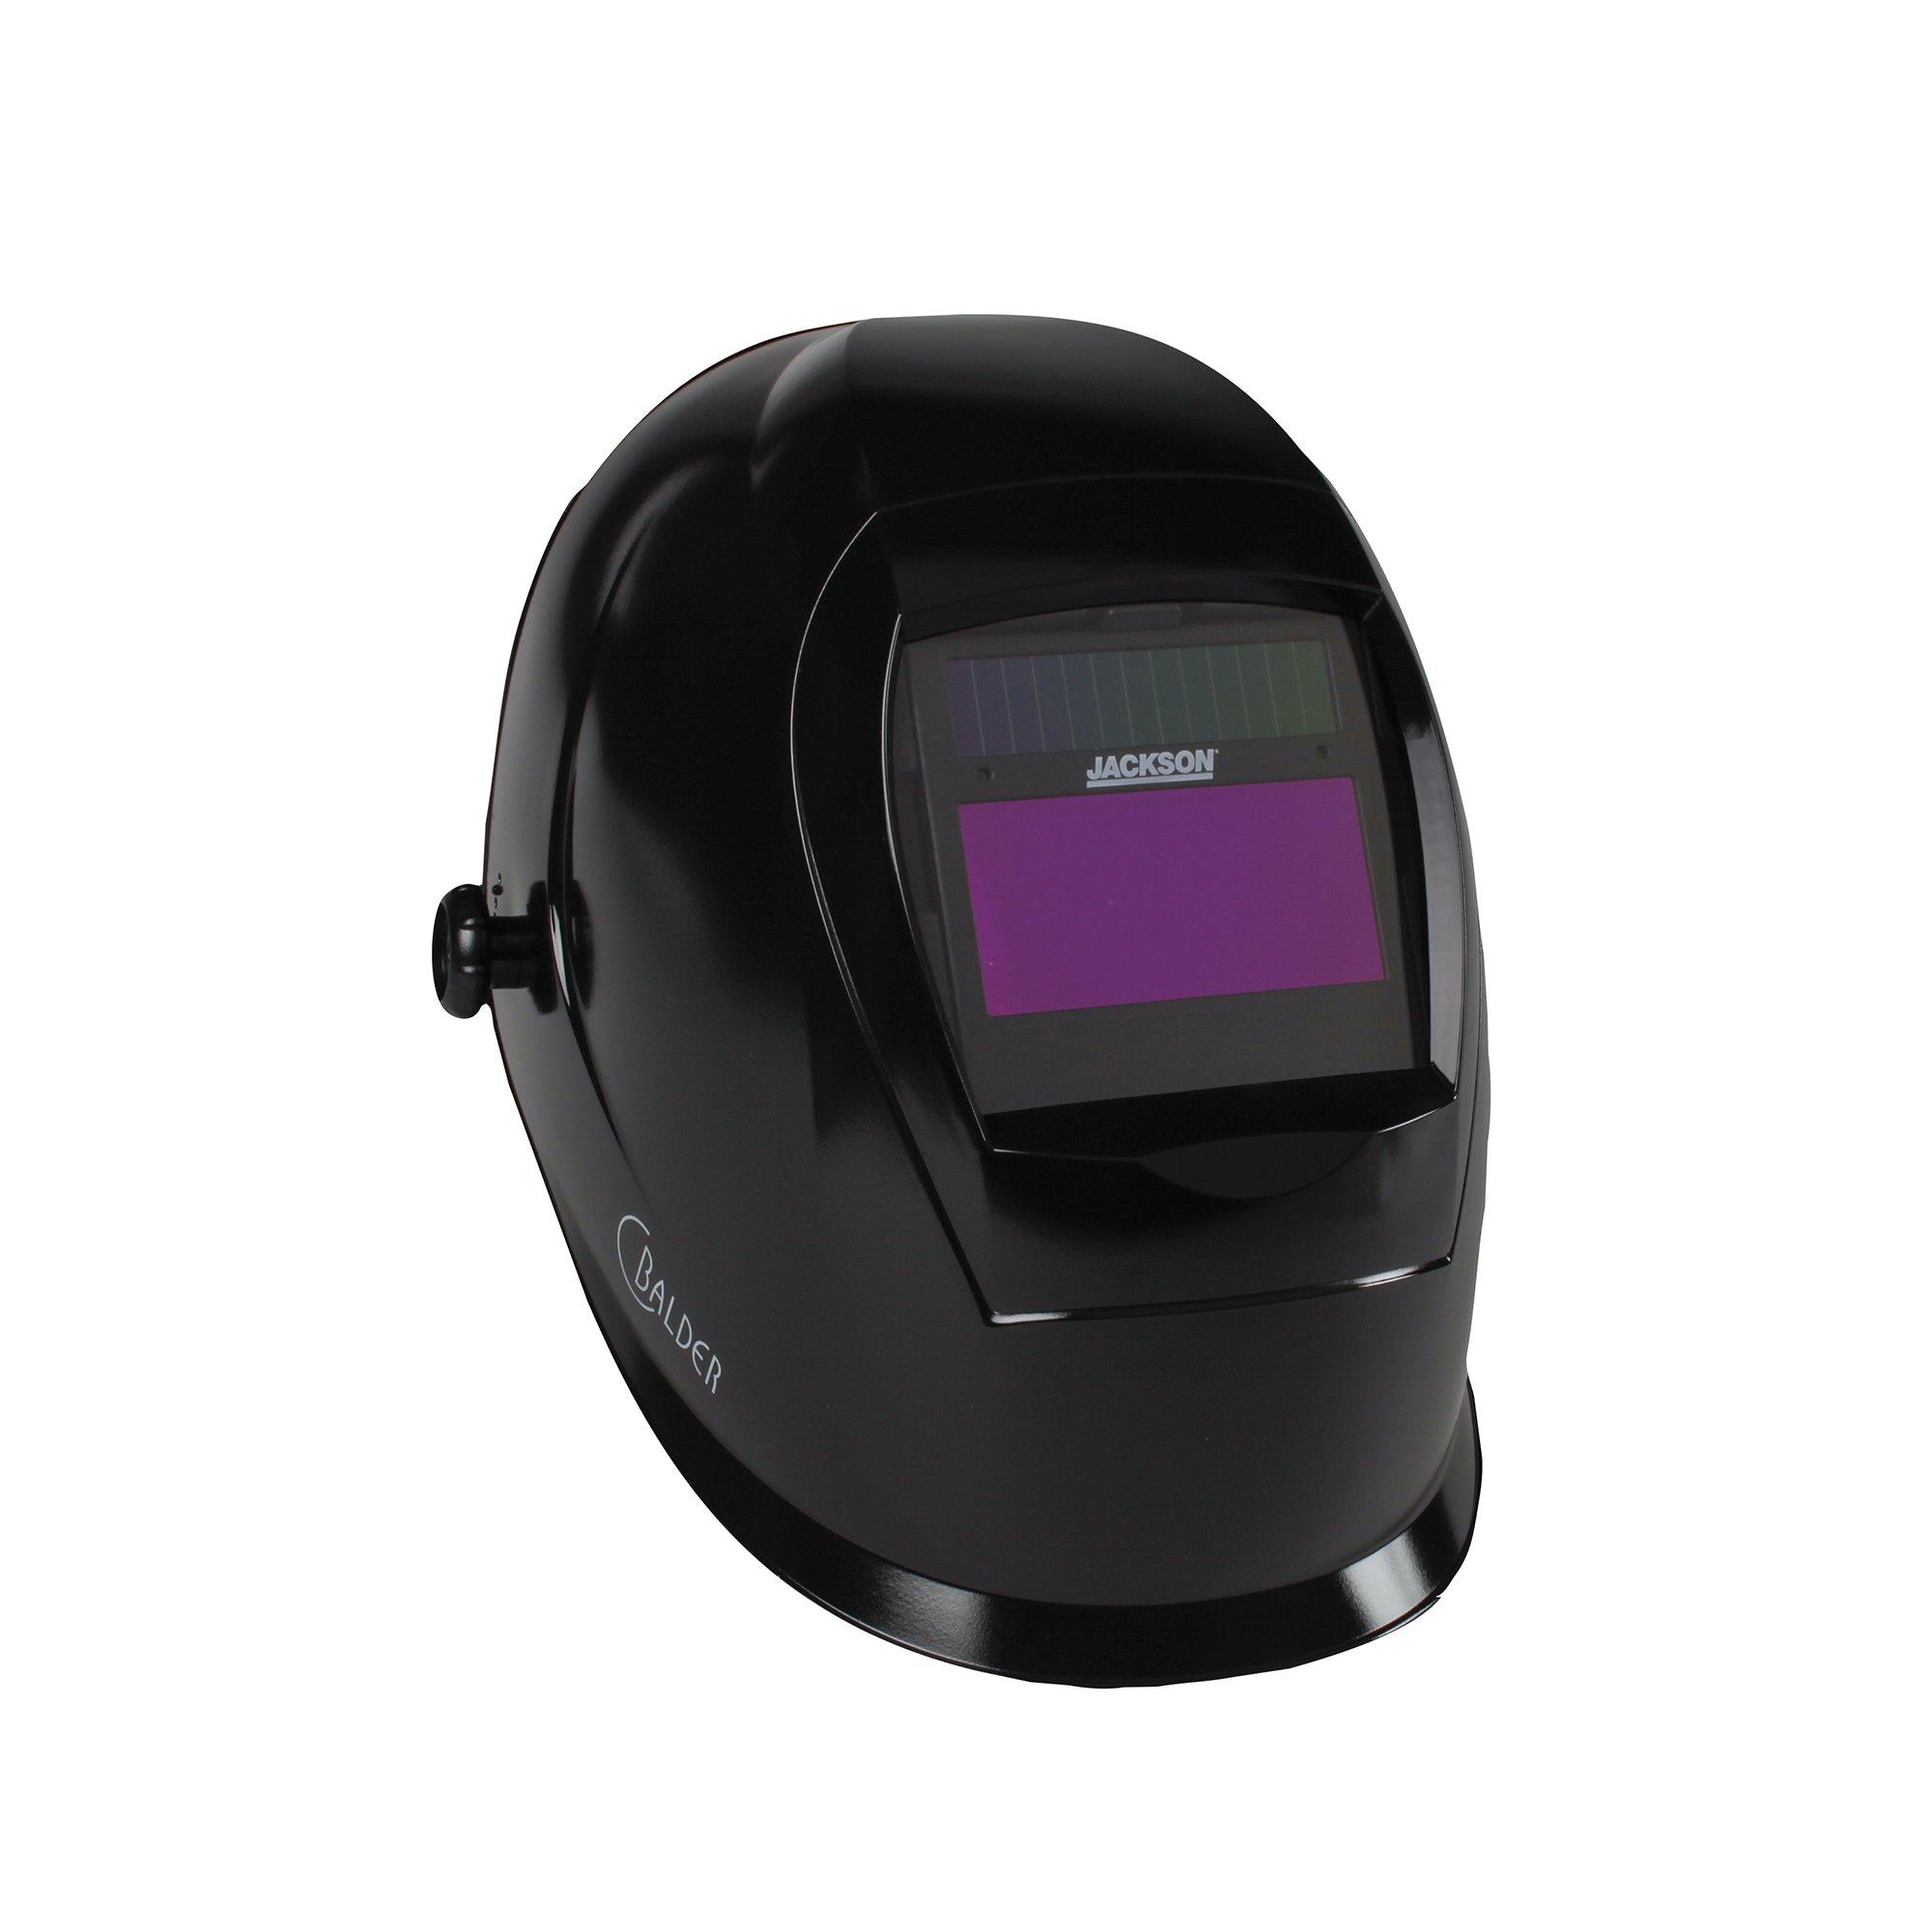 Jackson Safety SmarTIGer Variable Auto Darkening (ADF) Welding Helmet with Balder Technology (46140), Black by Jackson Safety